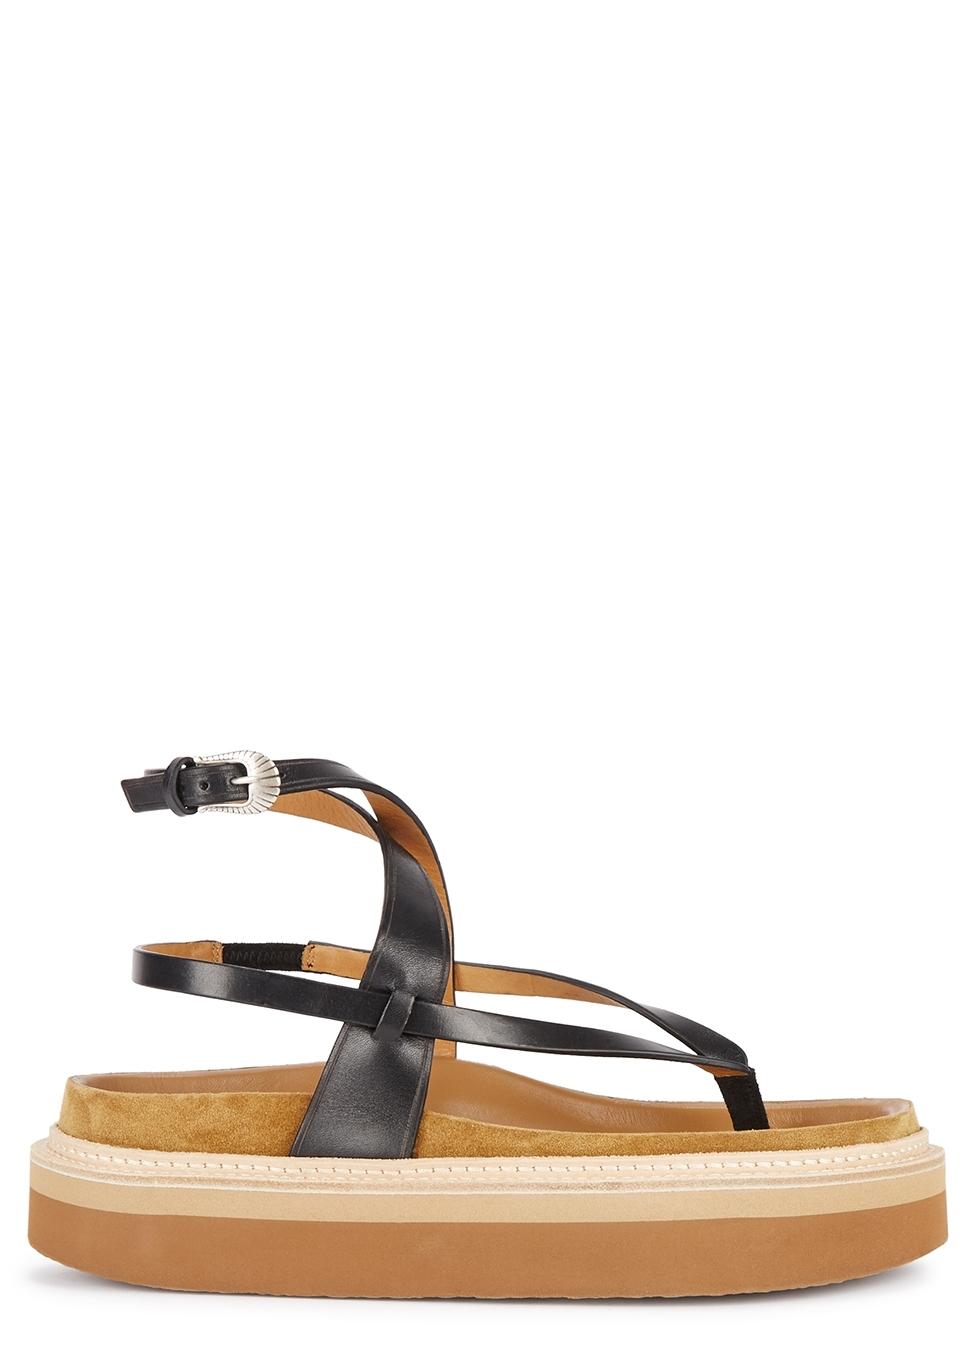 d95c19b5734c Women s Designer Flat Sandals - Harvey Nichols